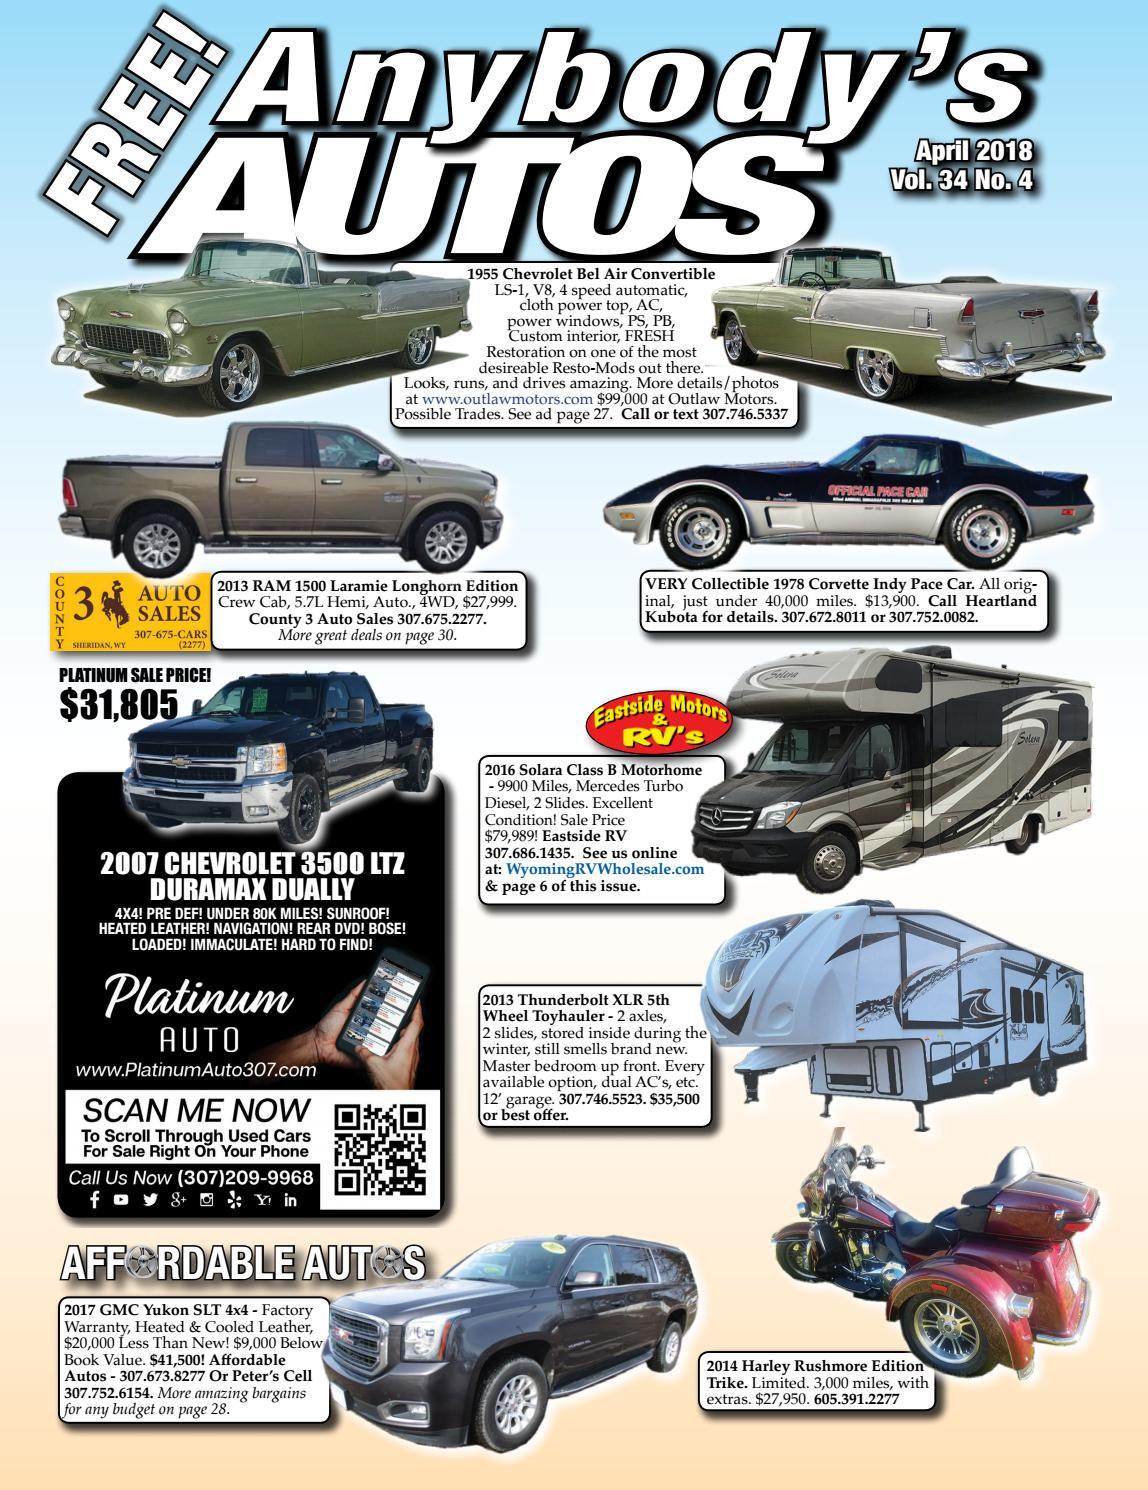 April 2018 by Anybodys Autos - issuu